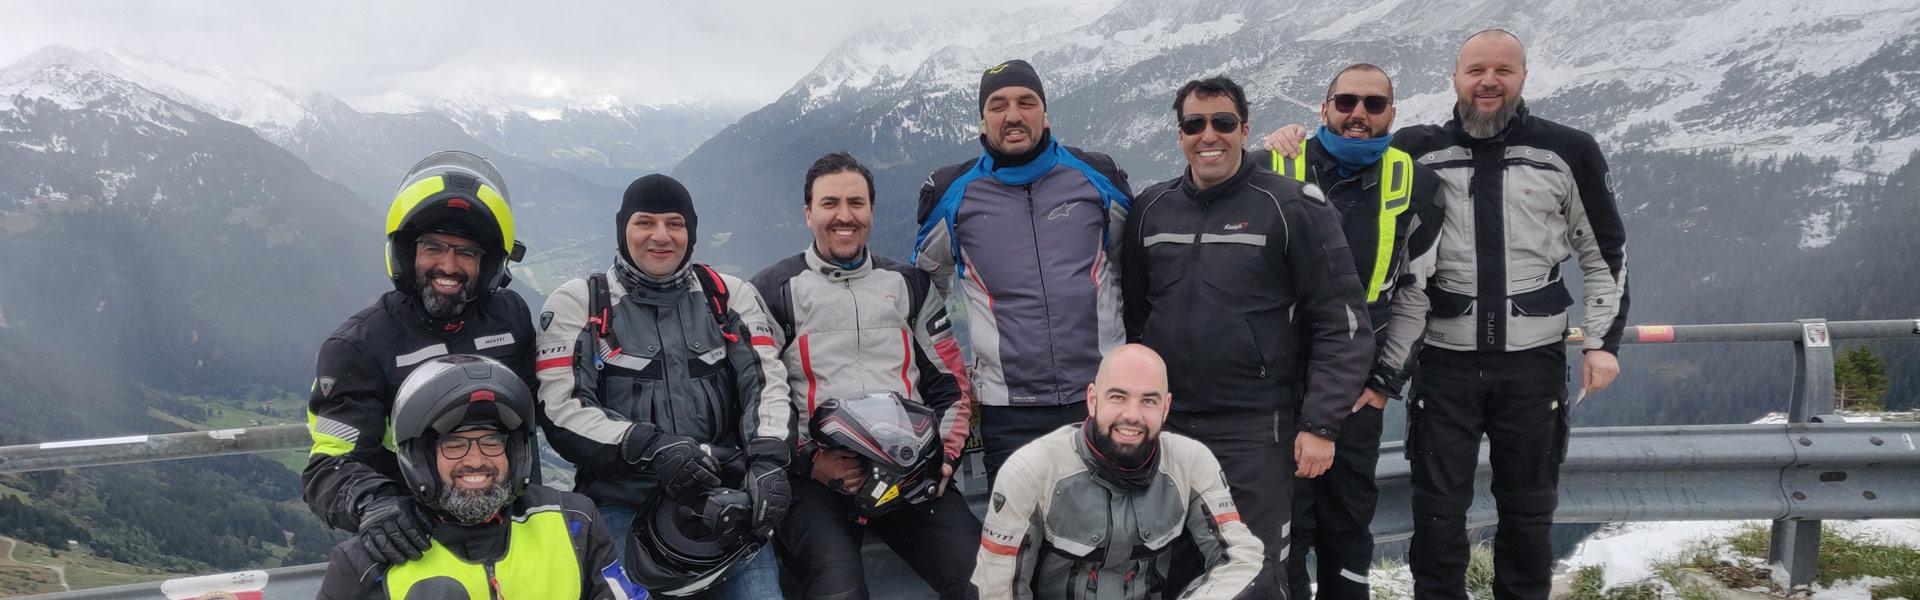 Alpentour 2020 groepsfoto